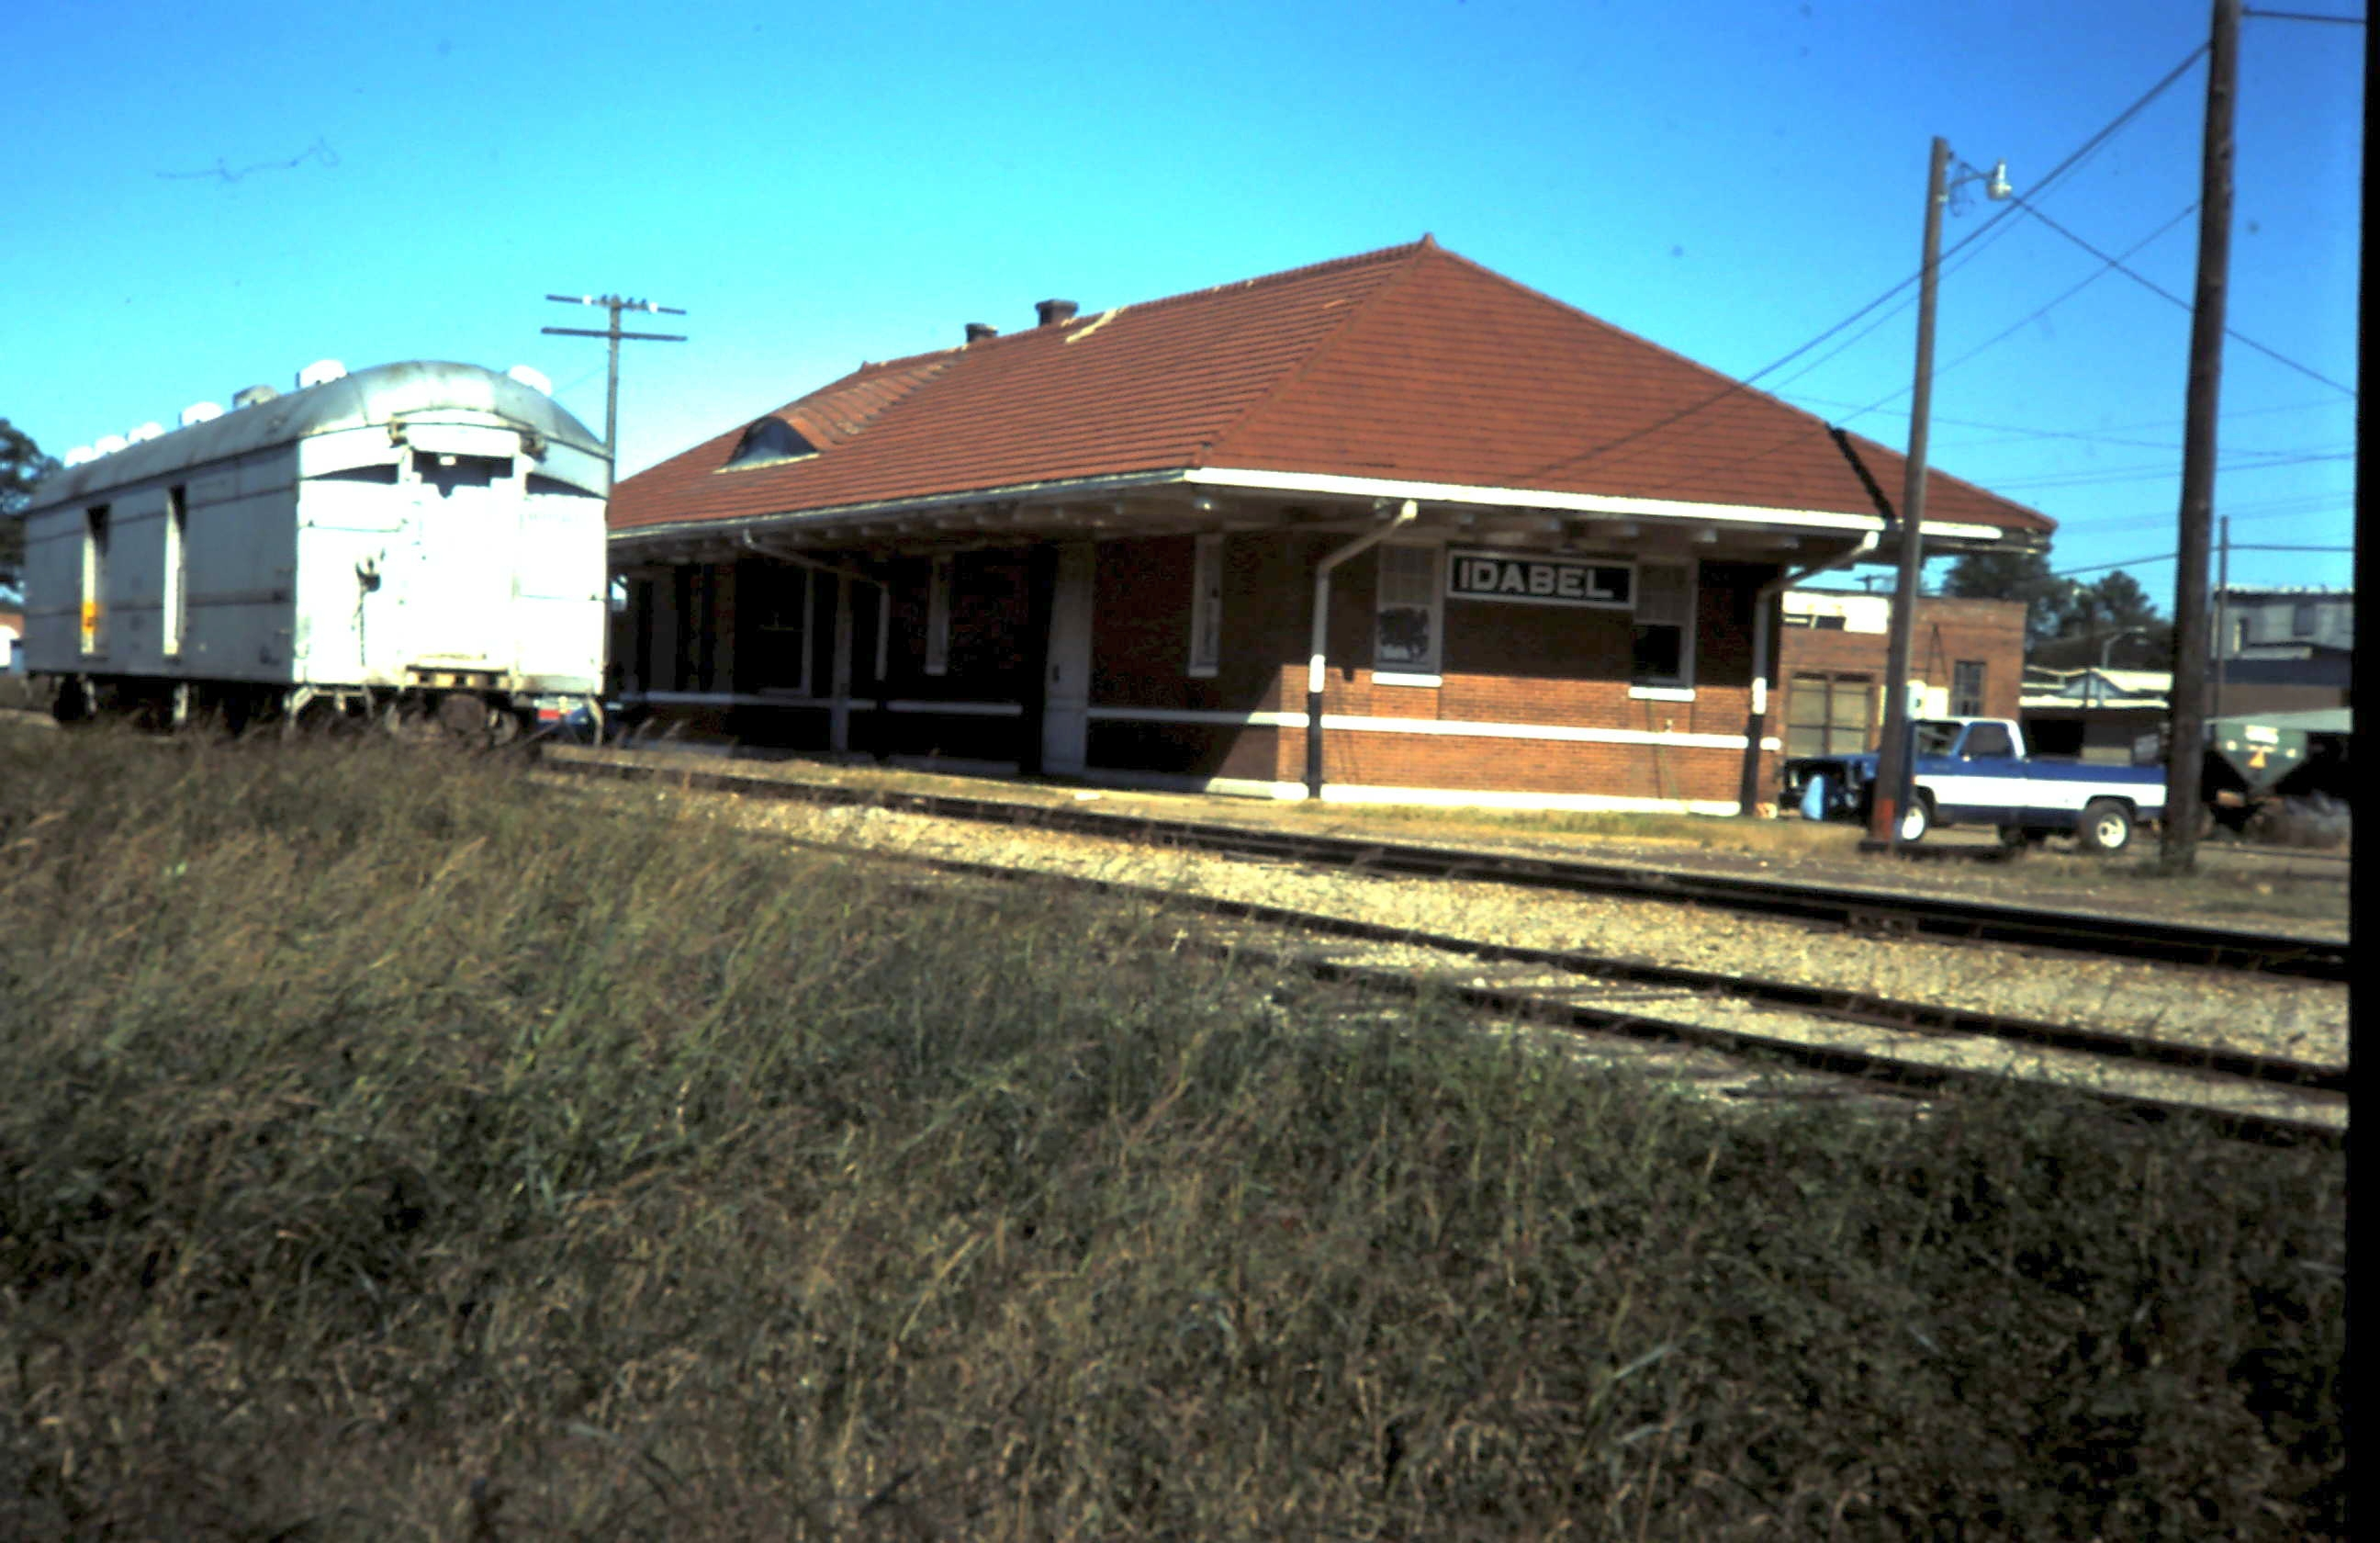 Idabel Oklahoma Depot